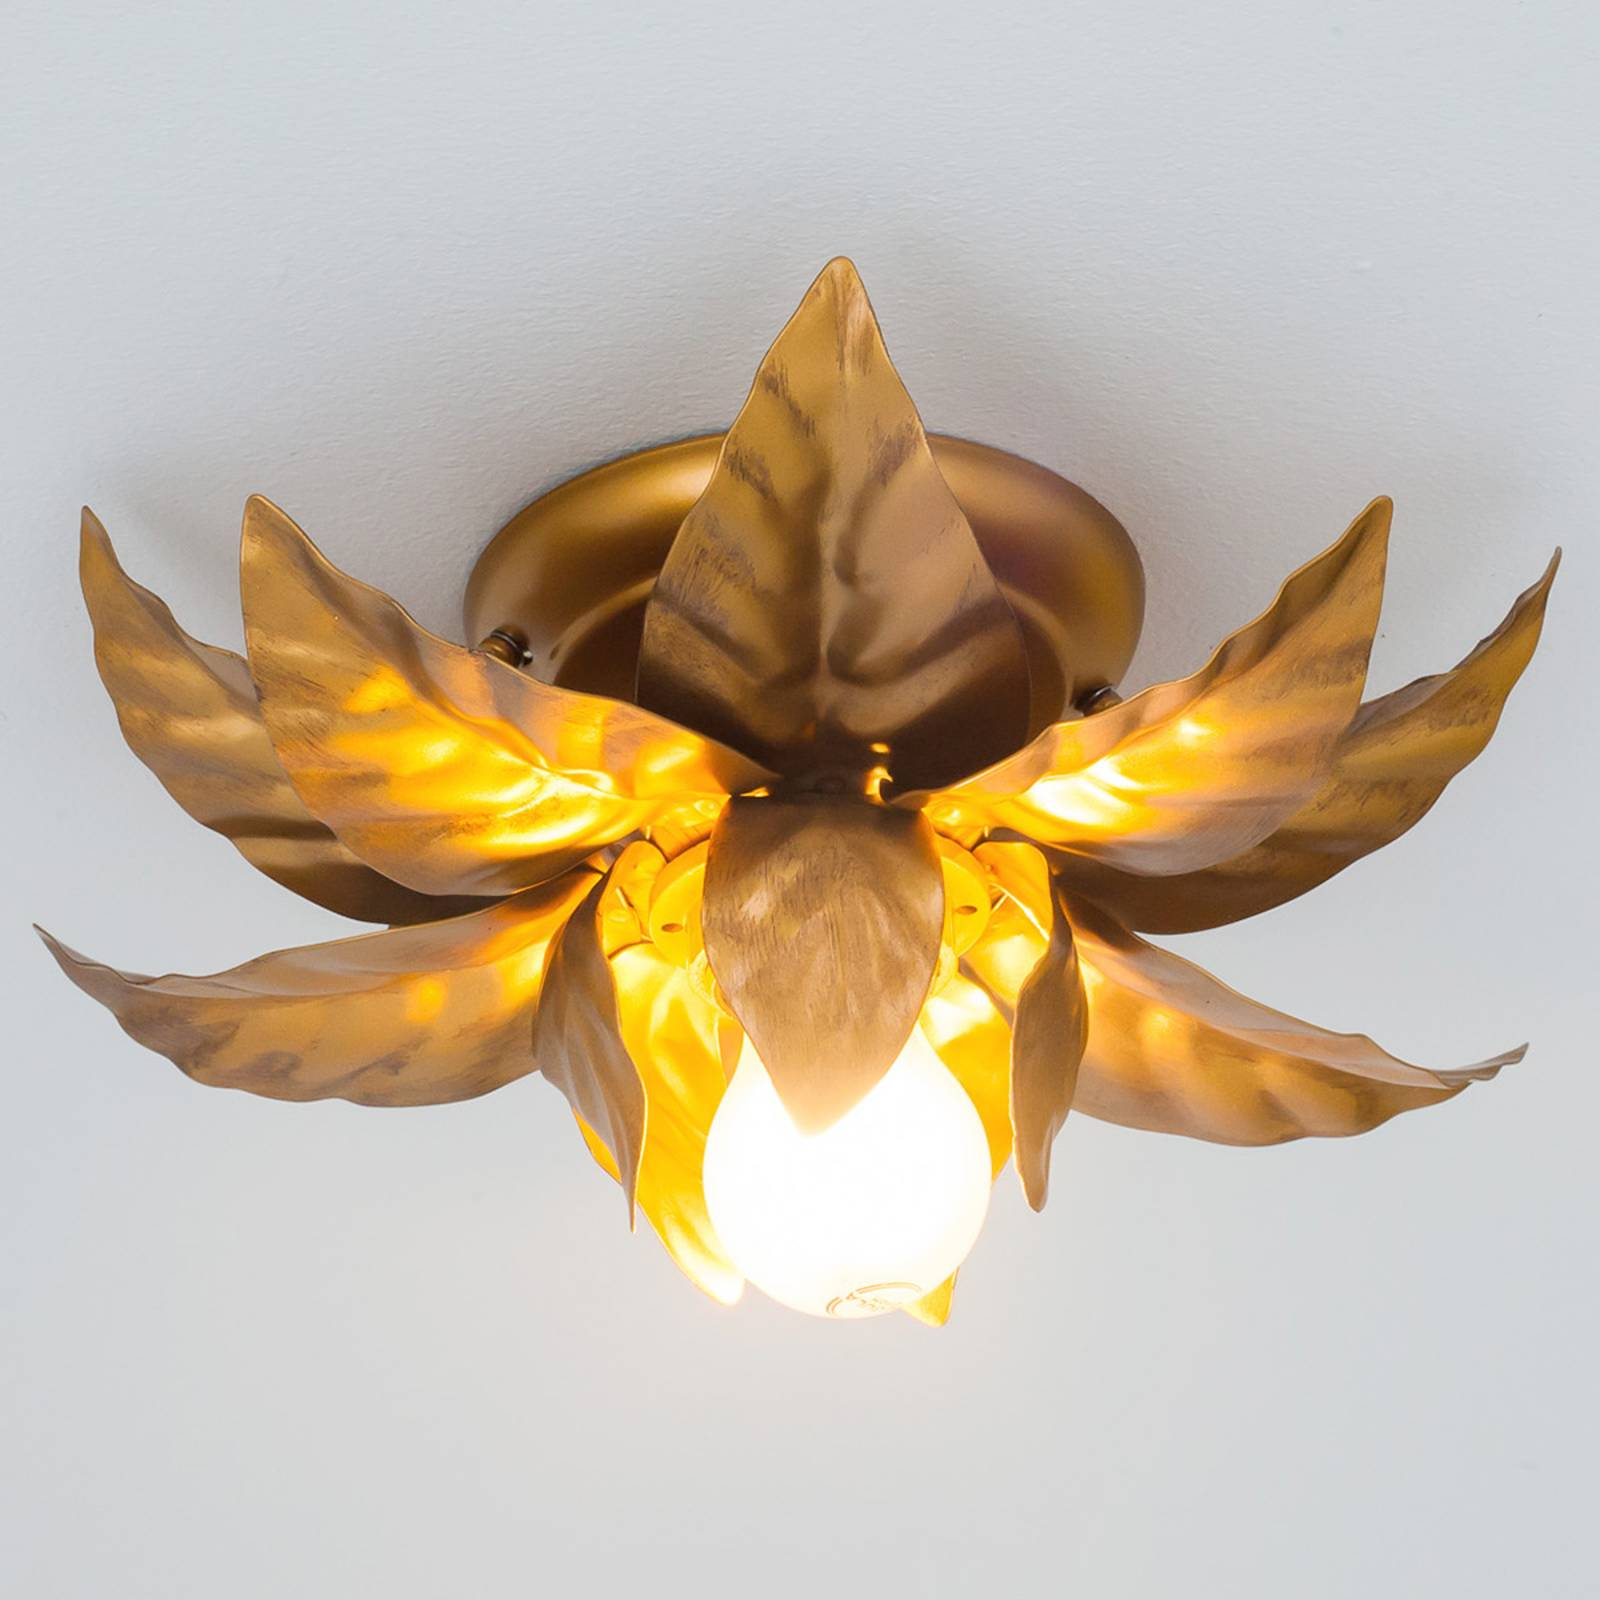 Plafondlamp ANTIK met goudkleurige bladeren 26 cm